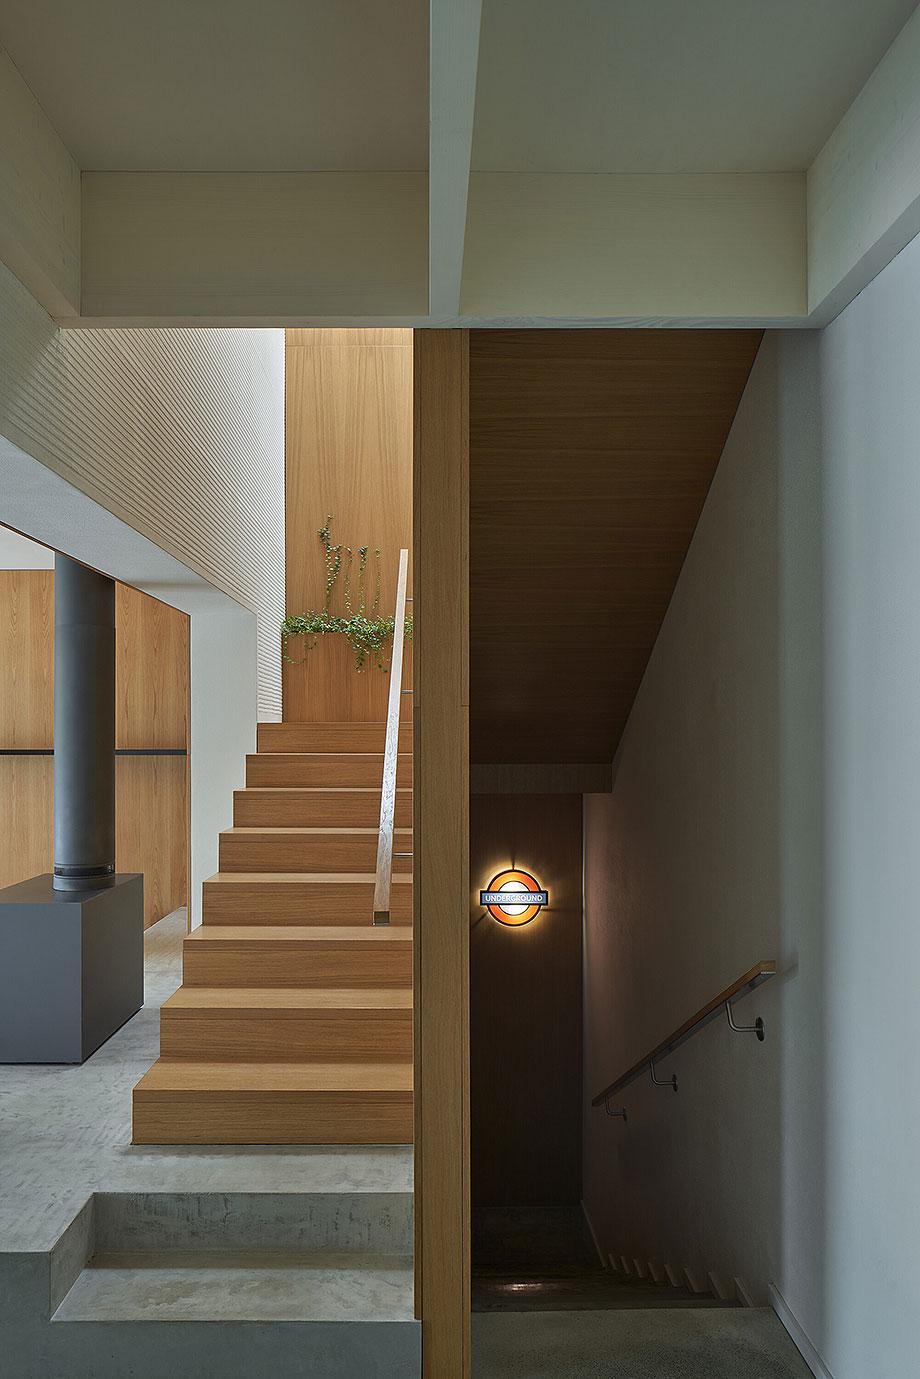 casa lhotka en praga de soa architekti y richter design (8) - foto boysplaynice